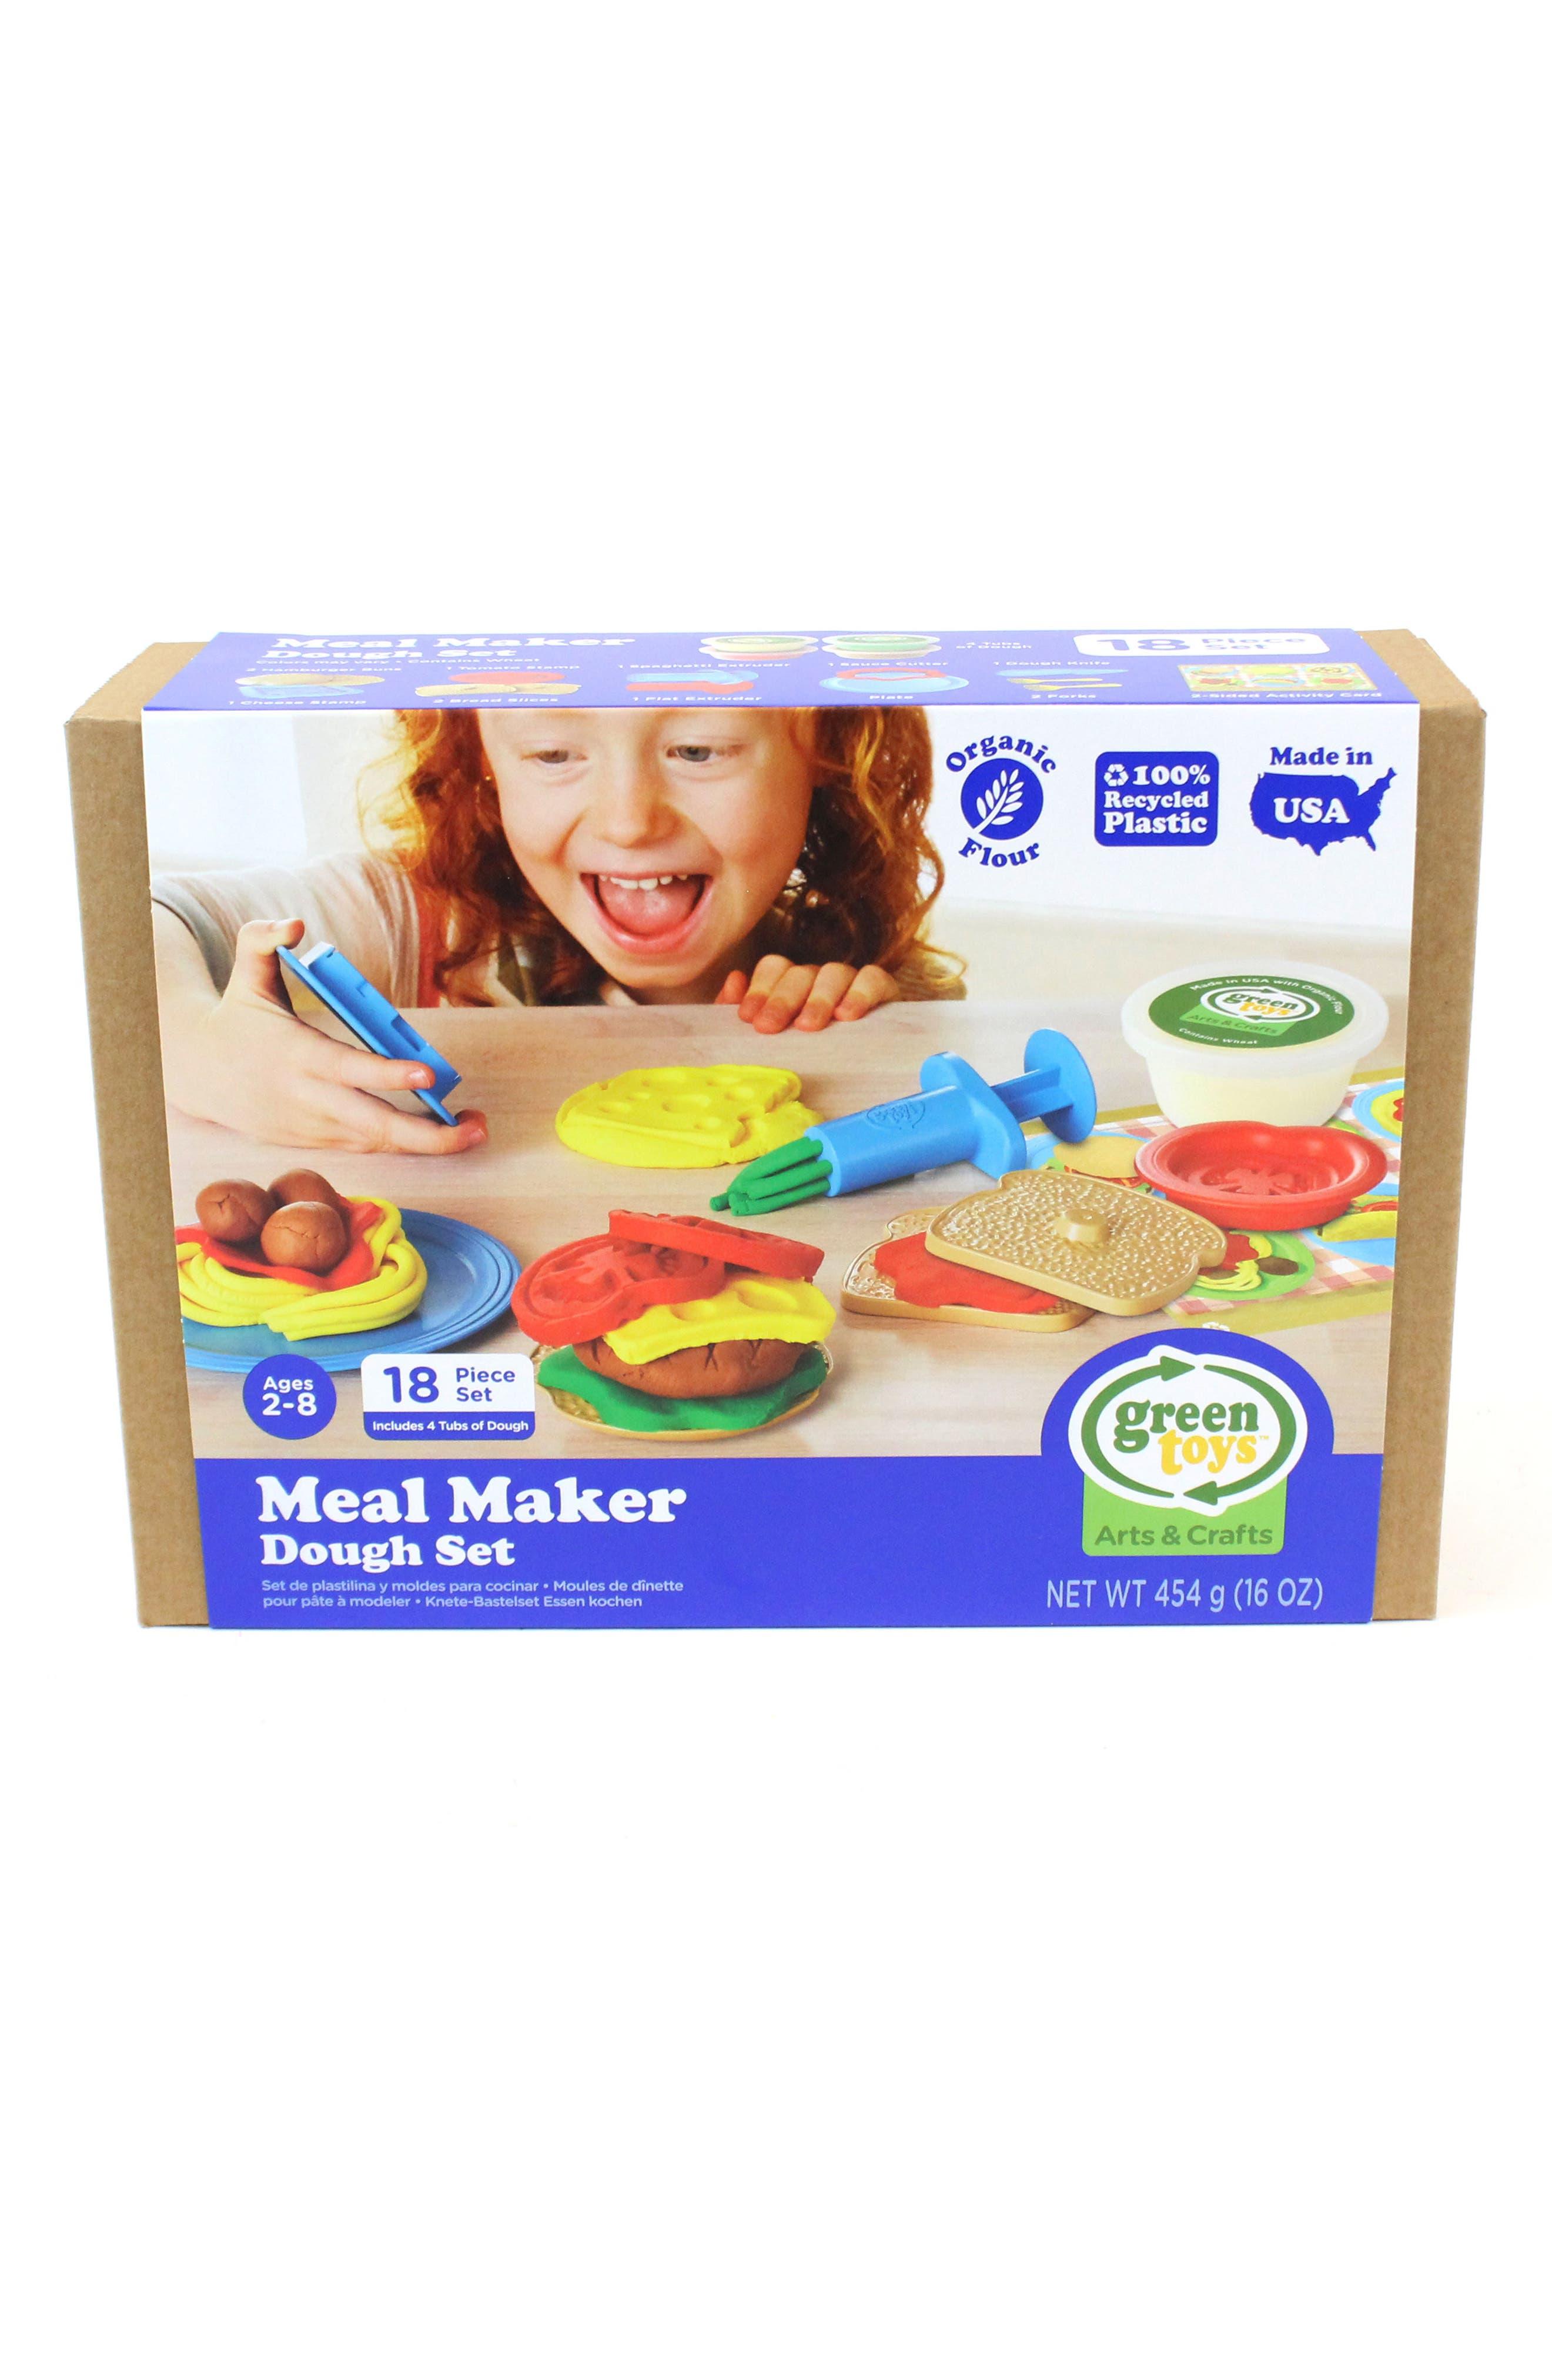 Alternate Image 1 Selected - Green Toys 18-Piece Plastic Meal Maker Dough Set